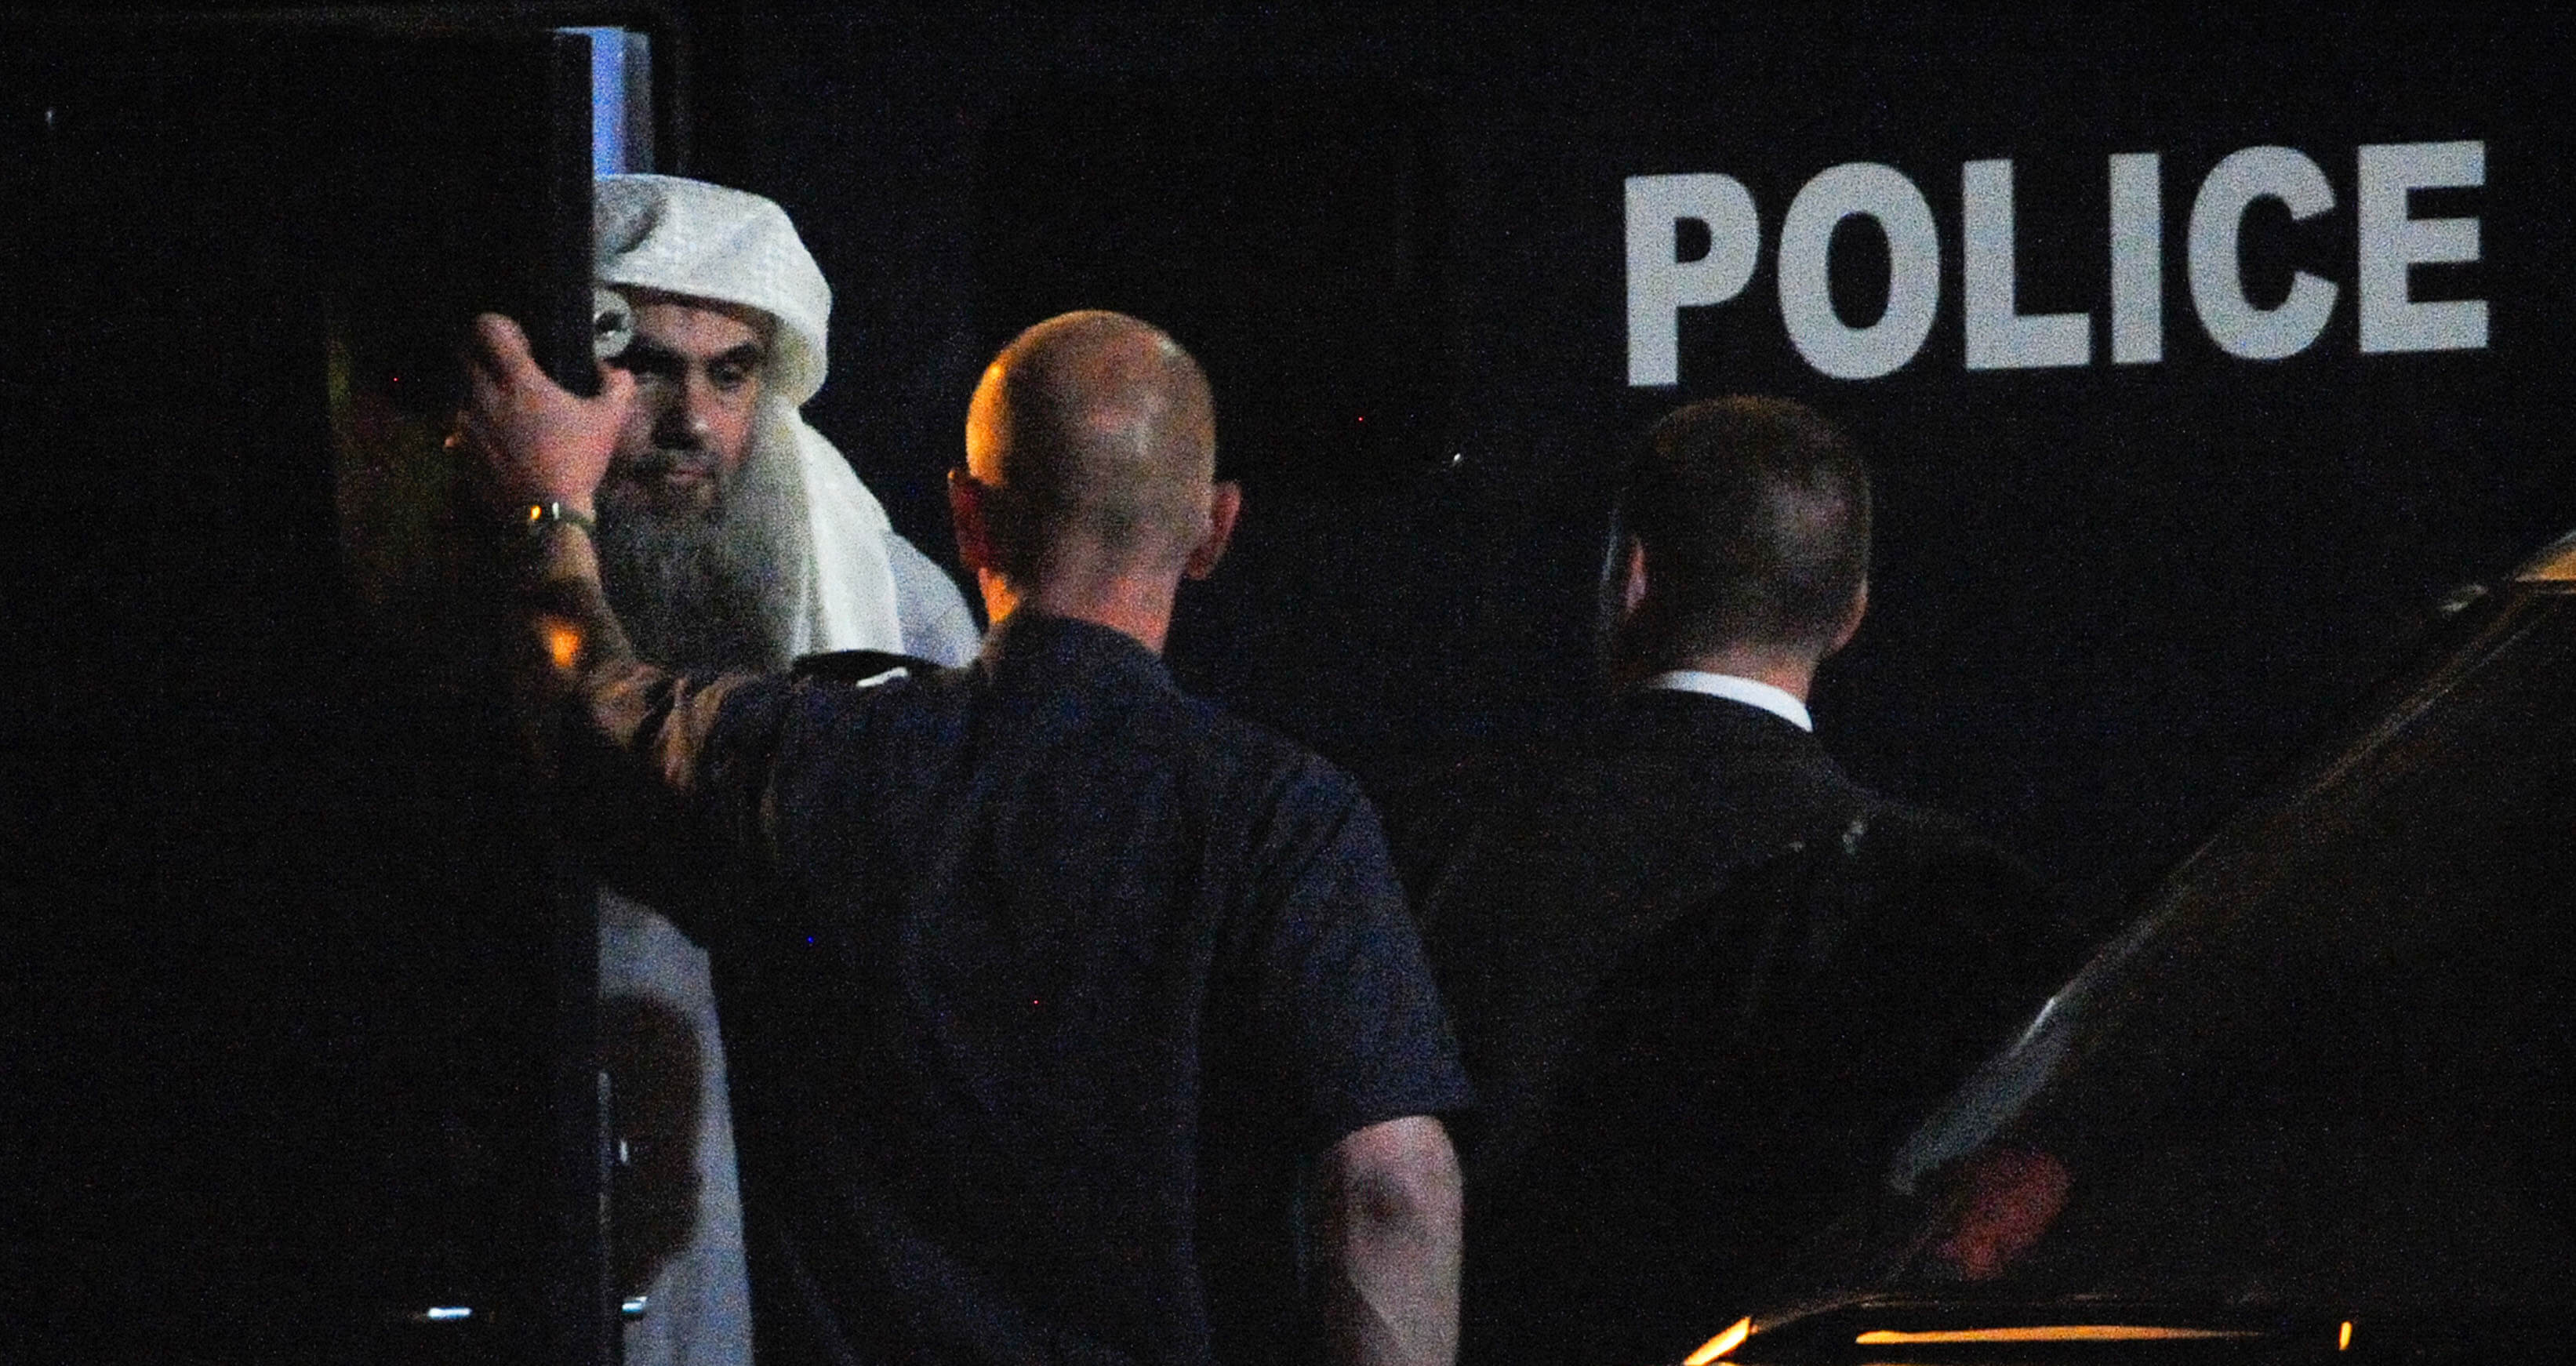 John Eekelaar on the response to Abu Qatada's deportation